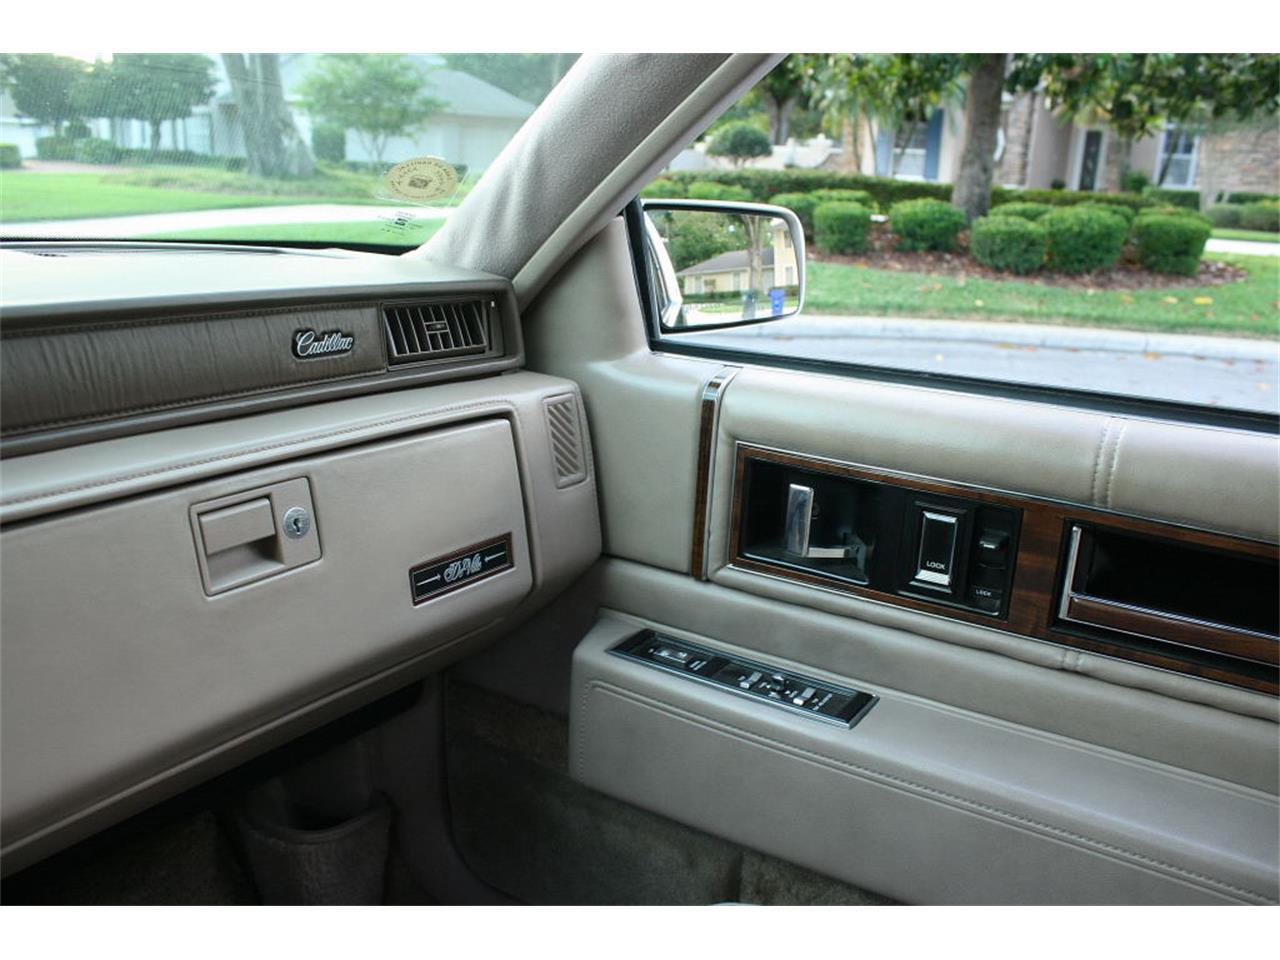 Large Picture of 1991 Cadillac Sedan - $9,500.00 - L5XM